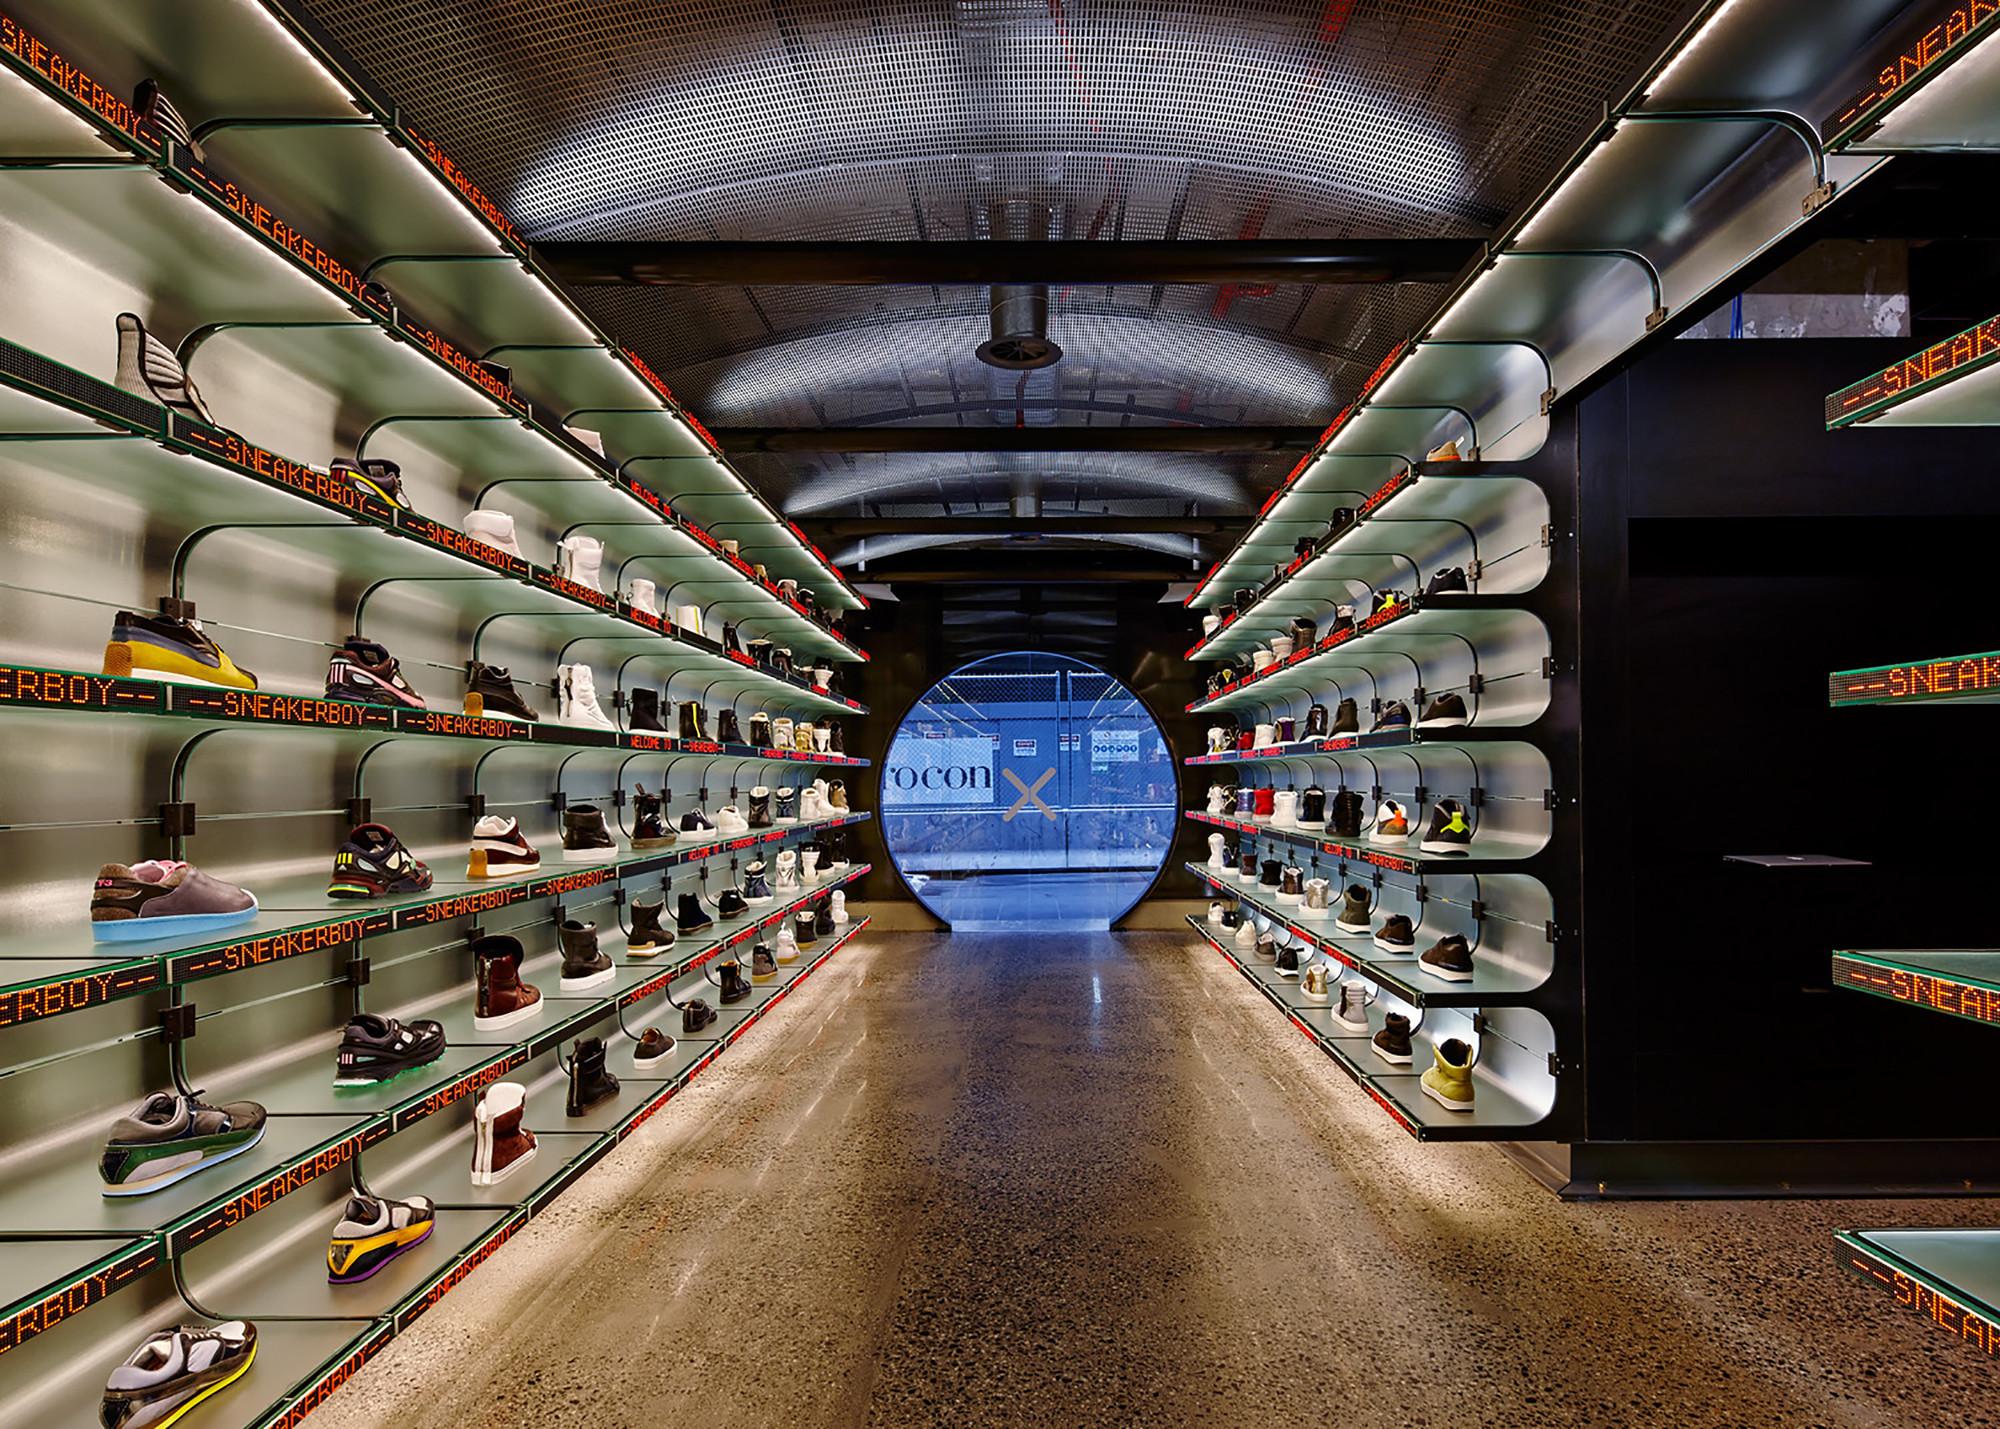 Sneakerboy Store  / March Studio, © Peter Bennetts